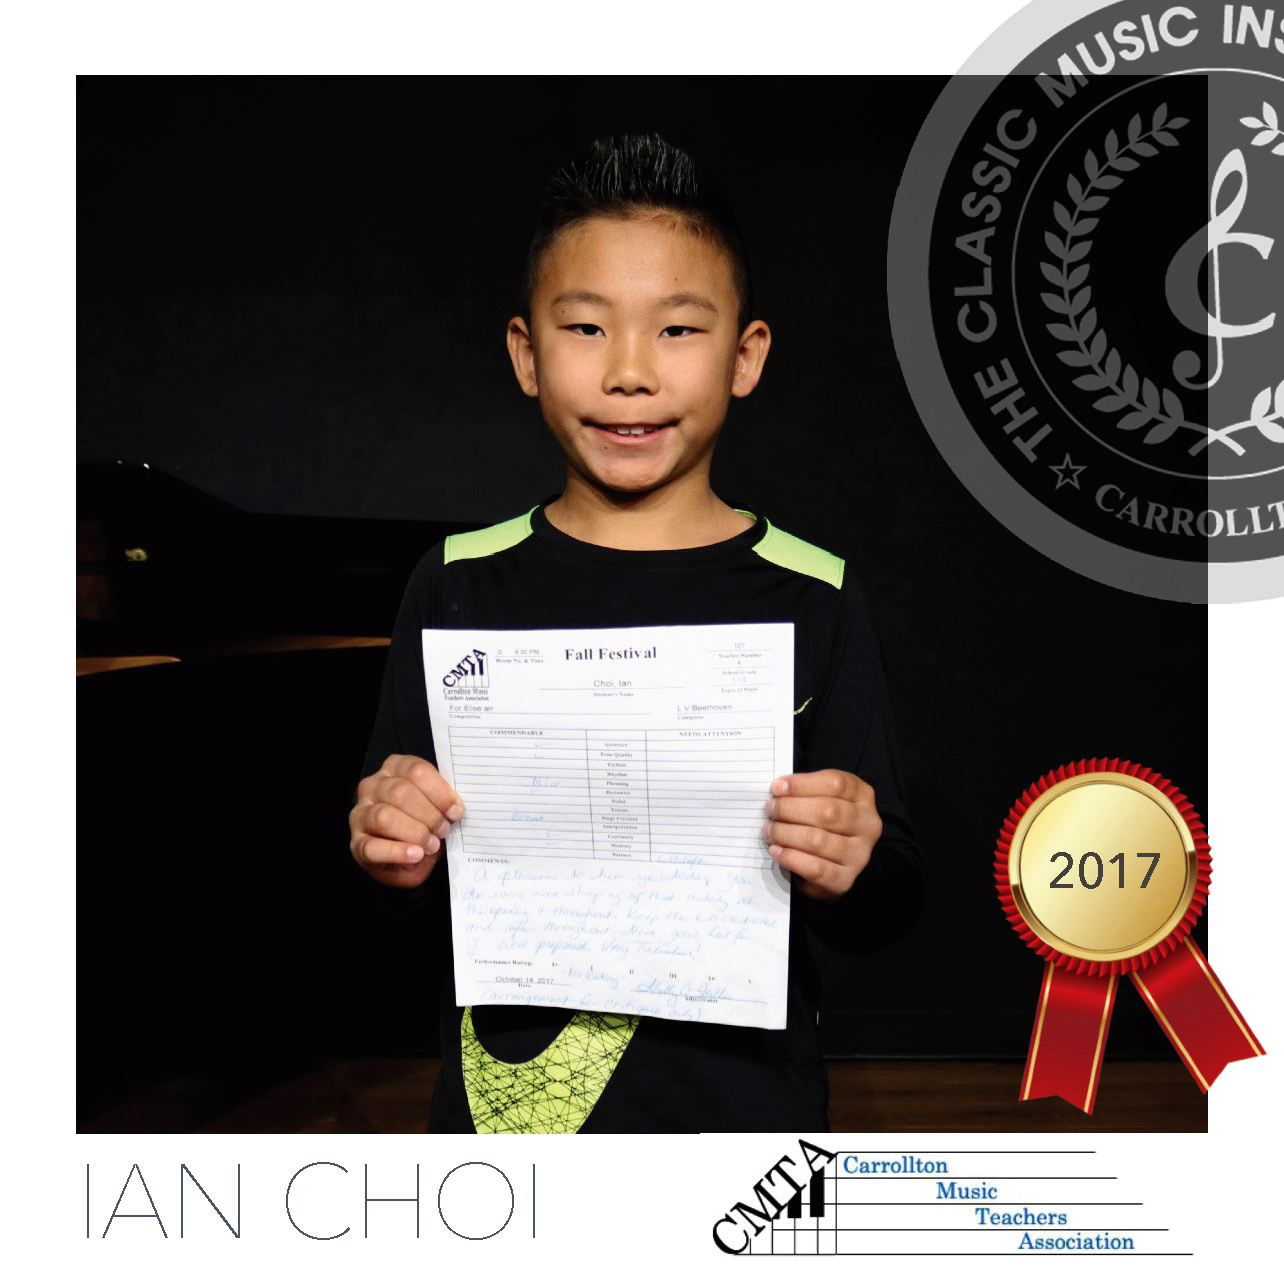 Ian Choi